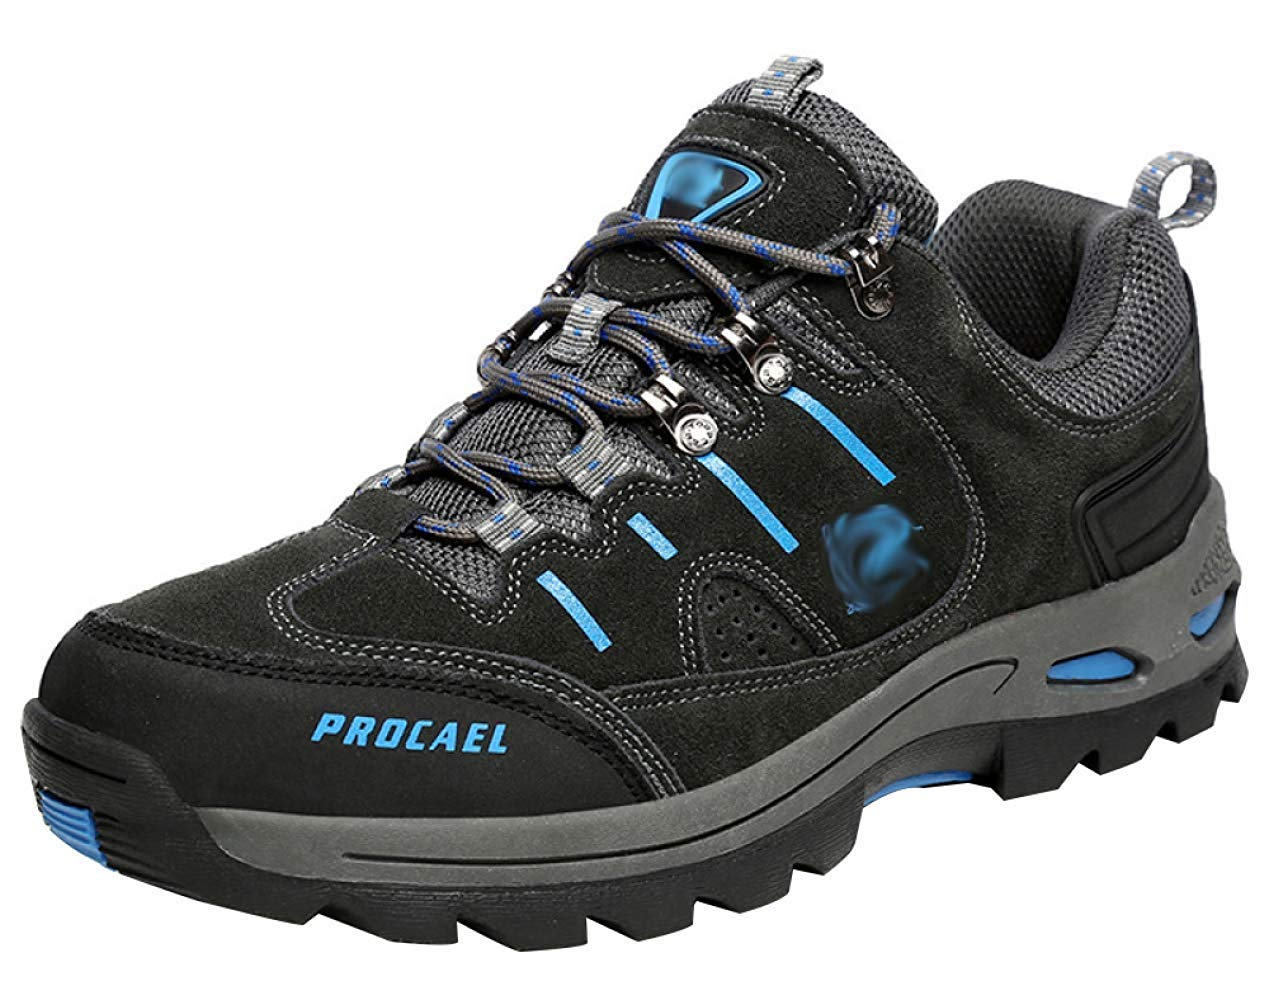 HhGold Männer Wanderschuhe Stiefel Leder Wanderschuhe Turnschuhe Für Outdoor Trekking Training Beiläufige Arbeit (Farbe : 21, Größe : 40EU)